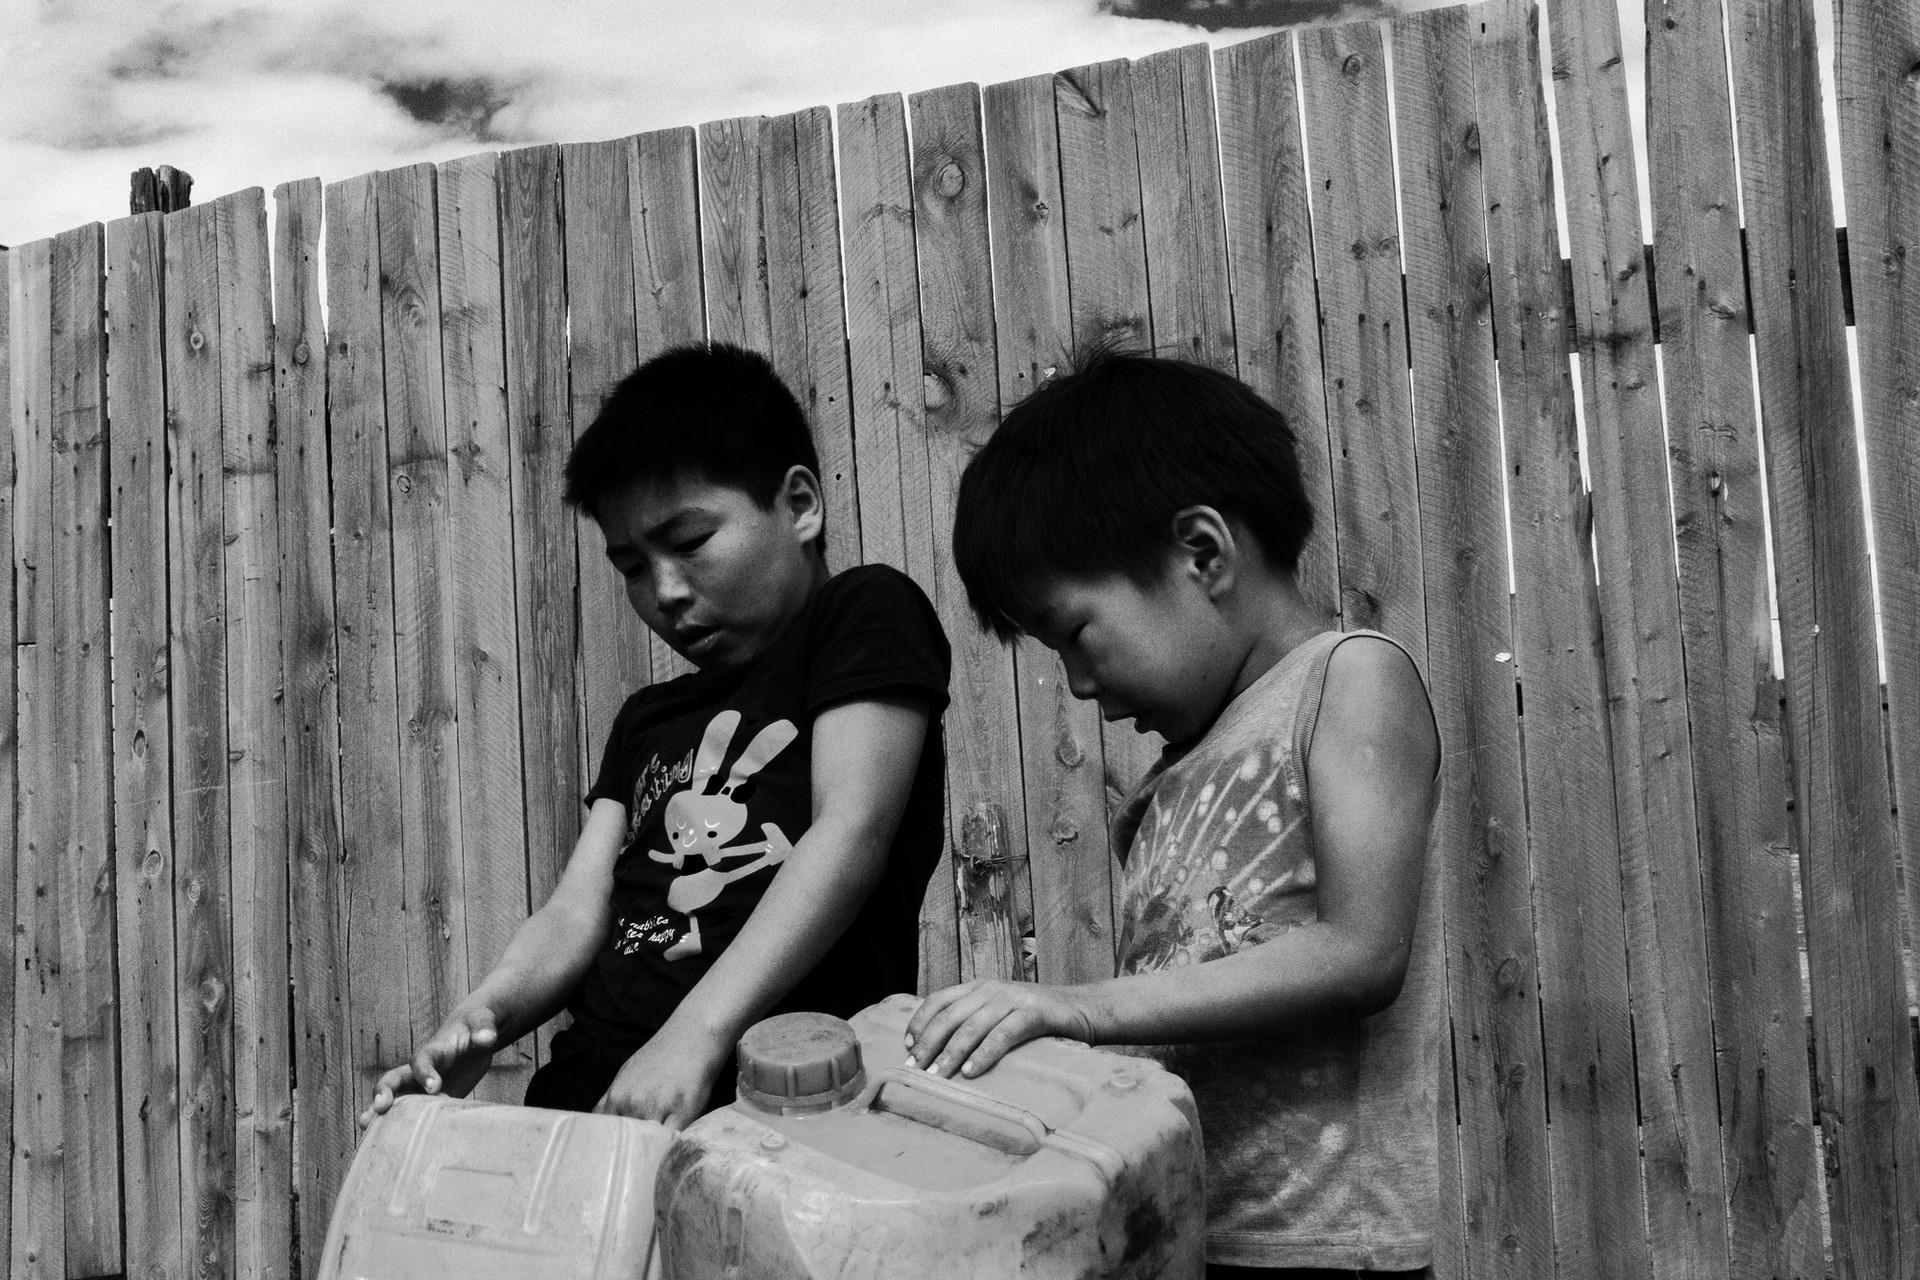 bambini acqua.jpg